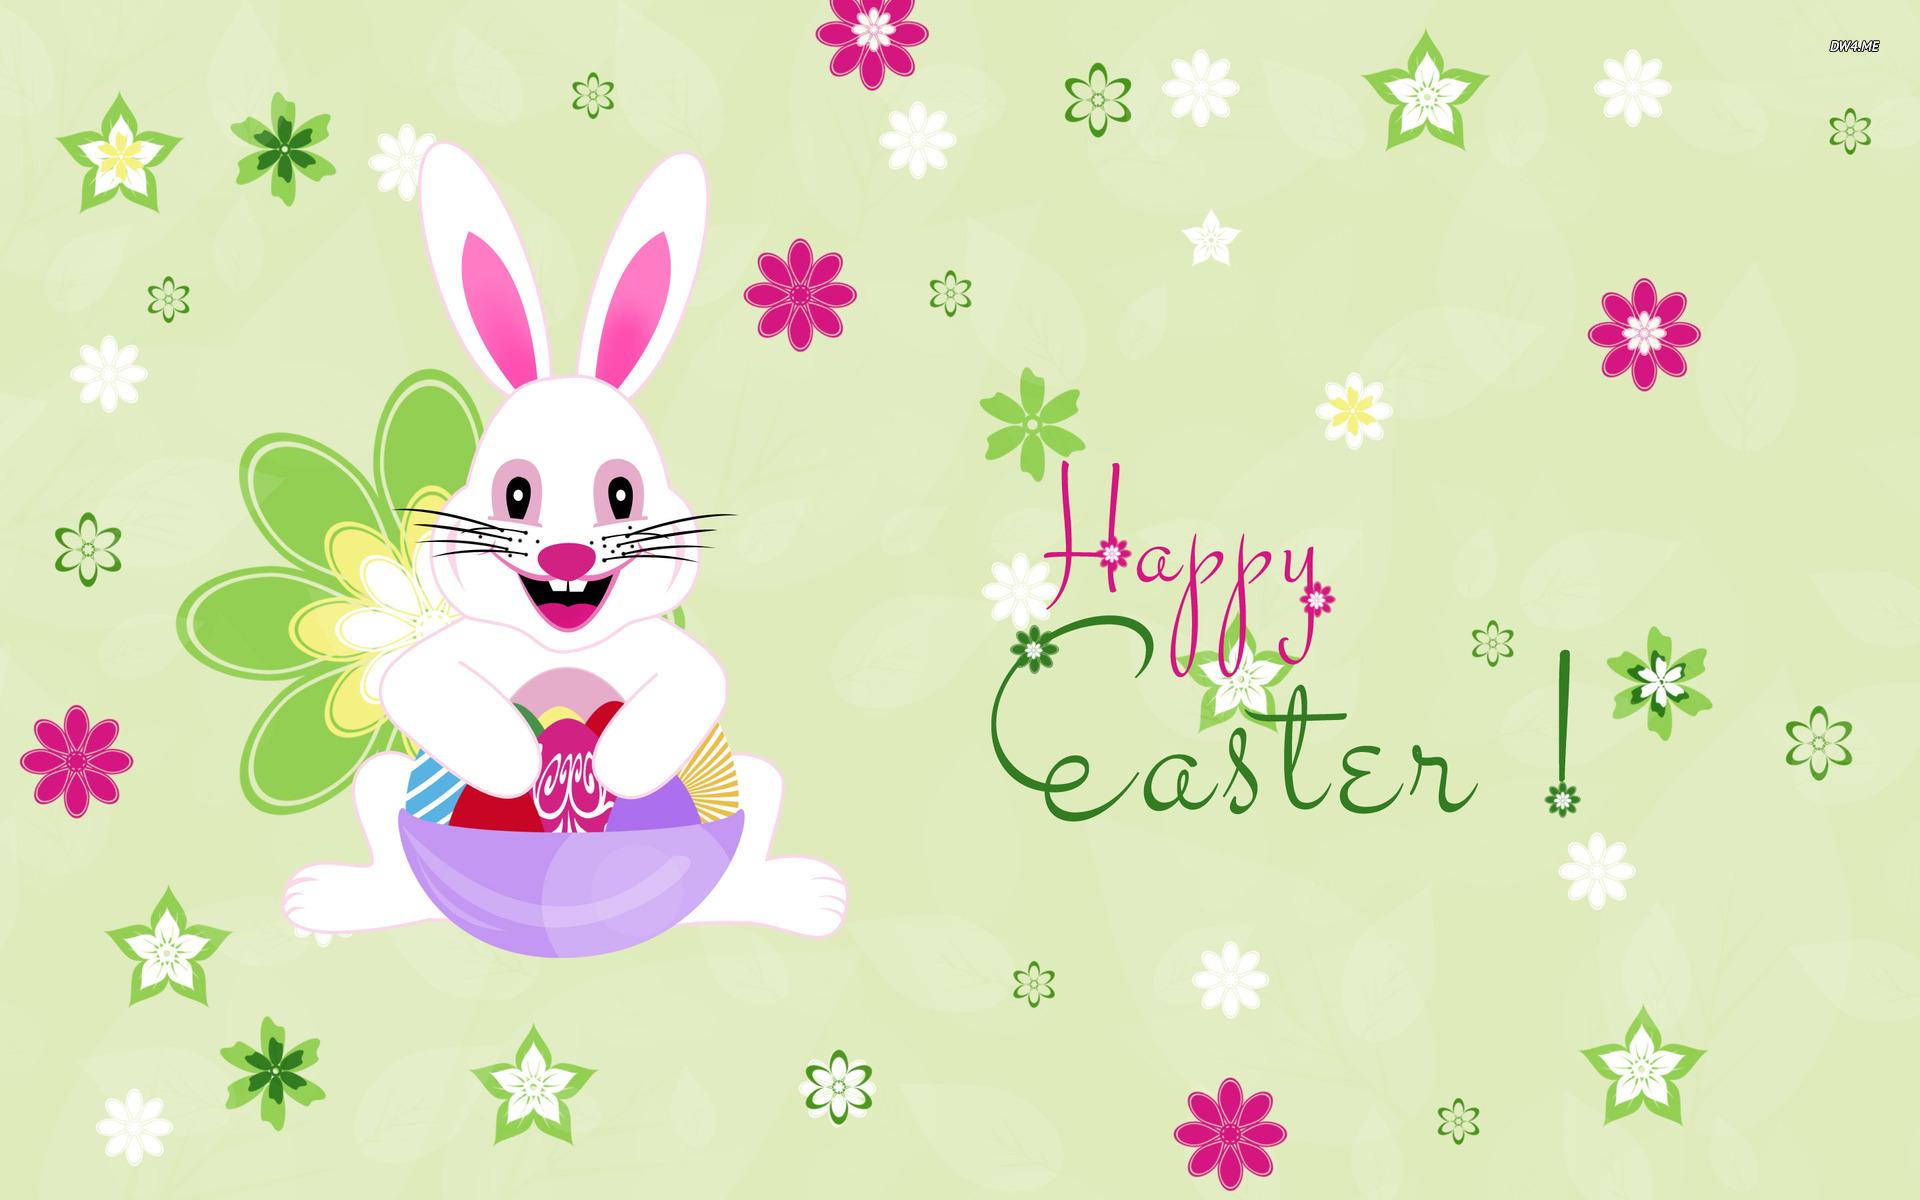 Disney Happy Easter Wallpaper 1920x1200